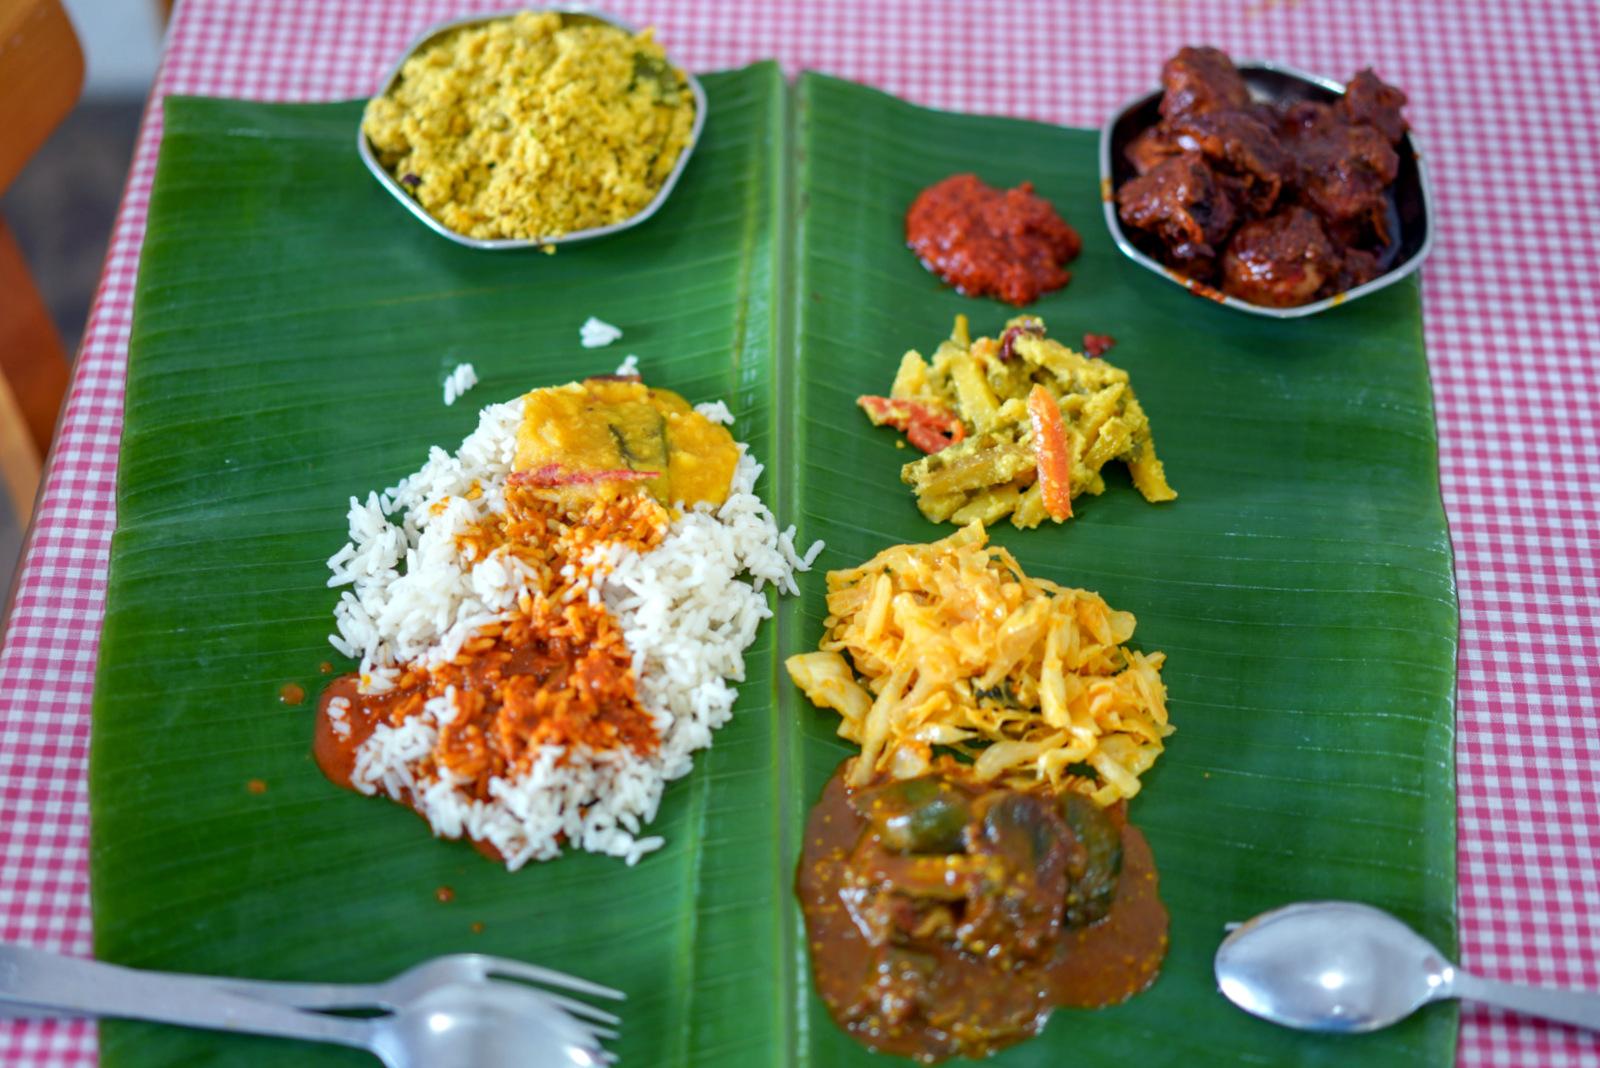 Shobana's Kerala Kitchen @ Petaling Jaya